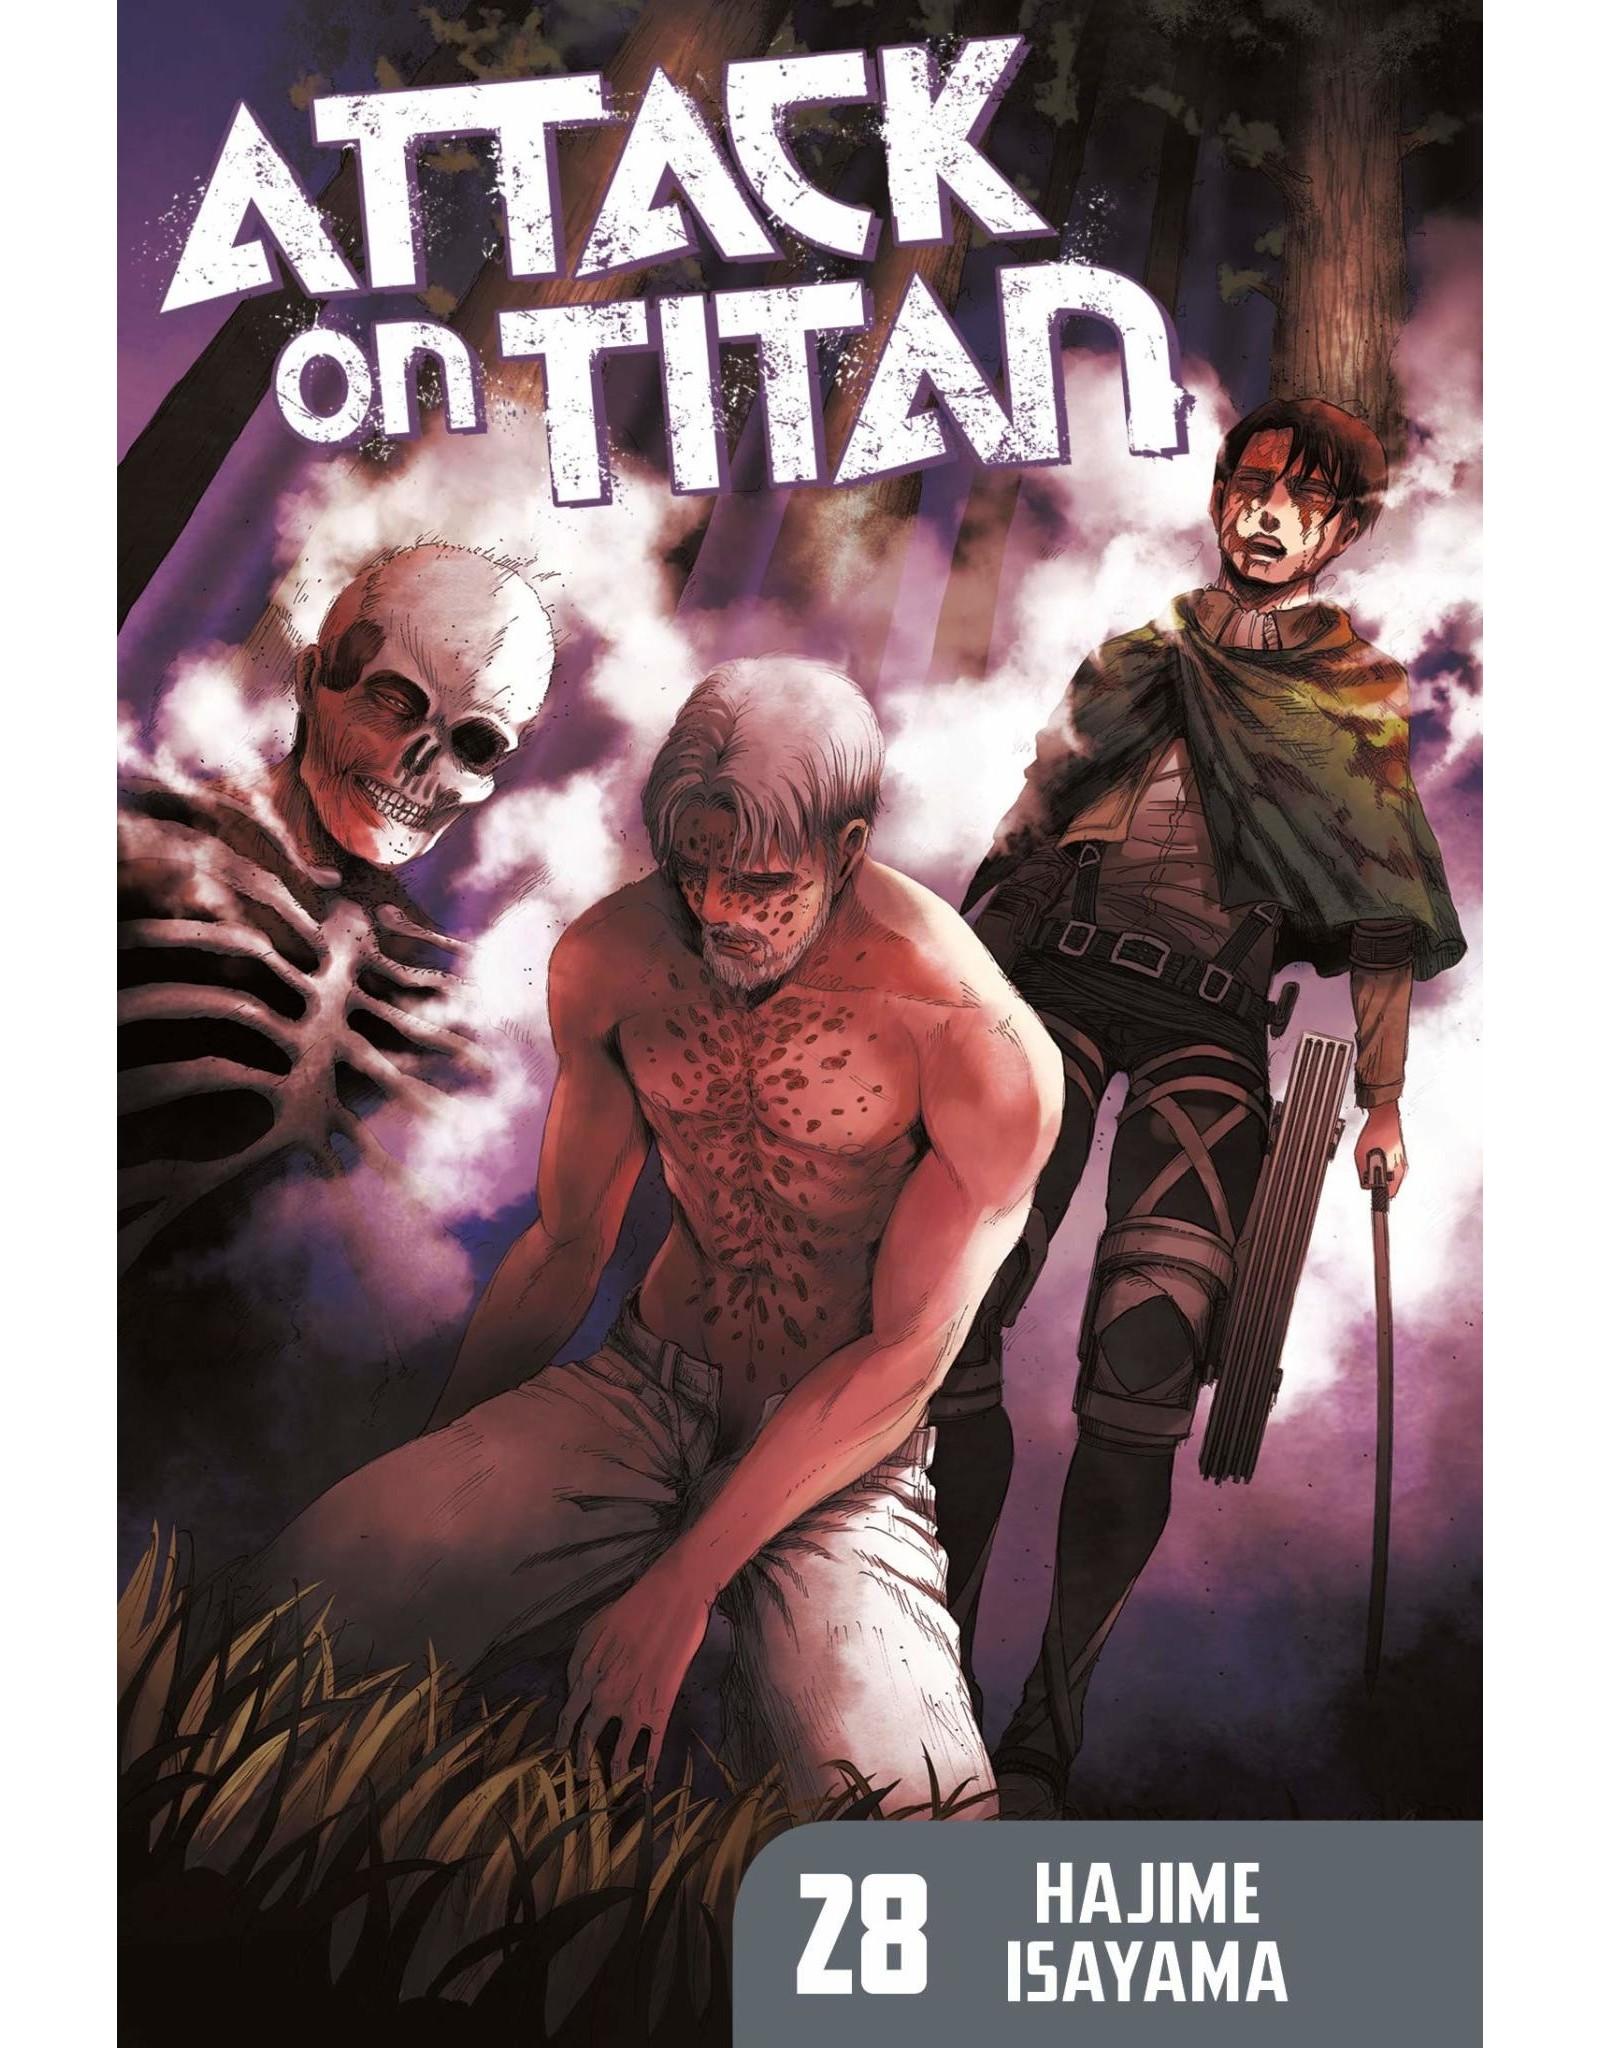 Attack on Titan 28 (English Version)